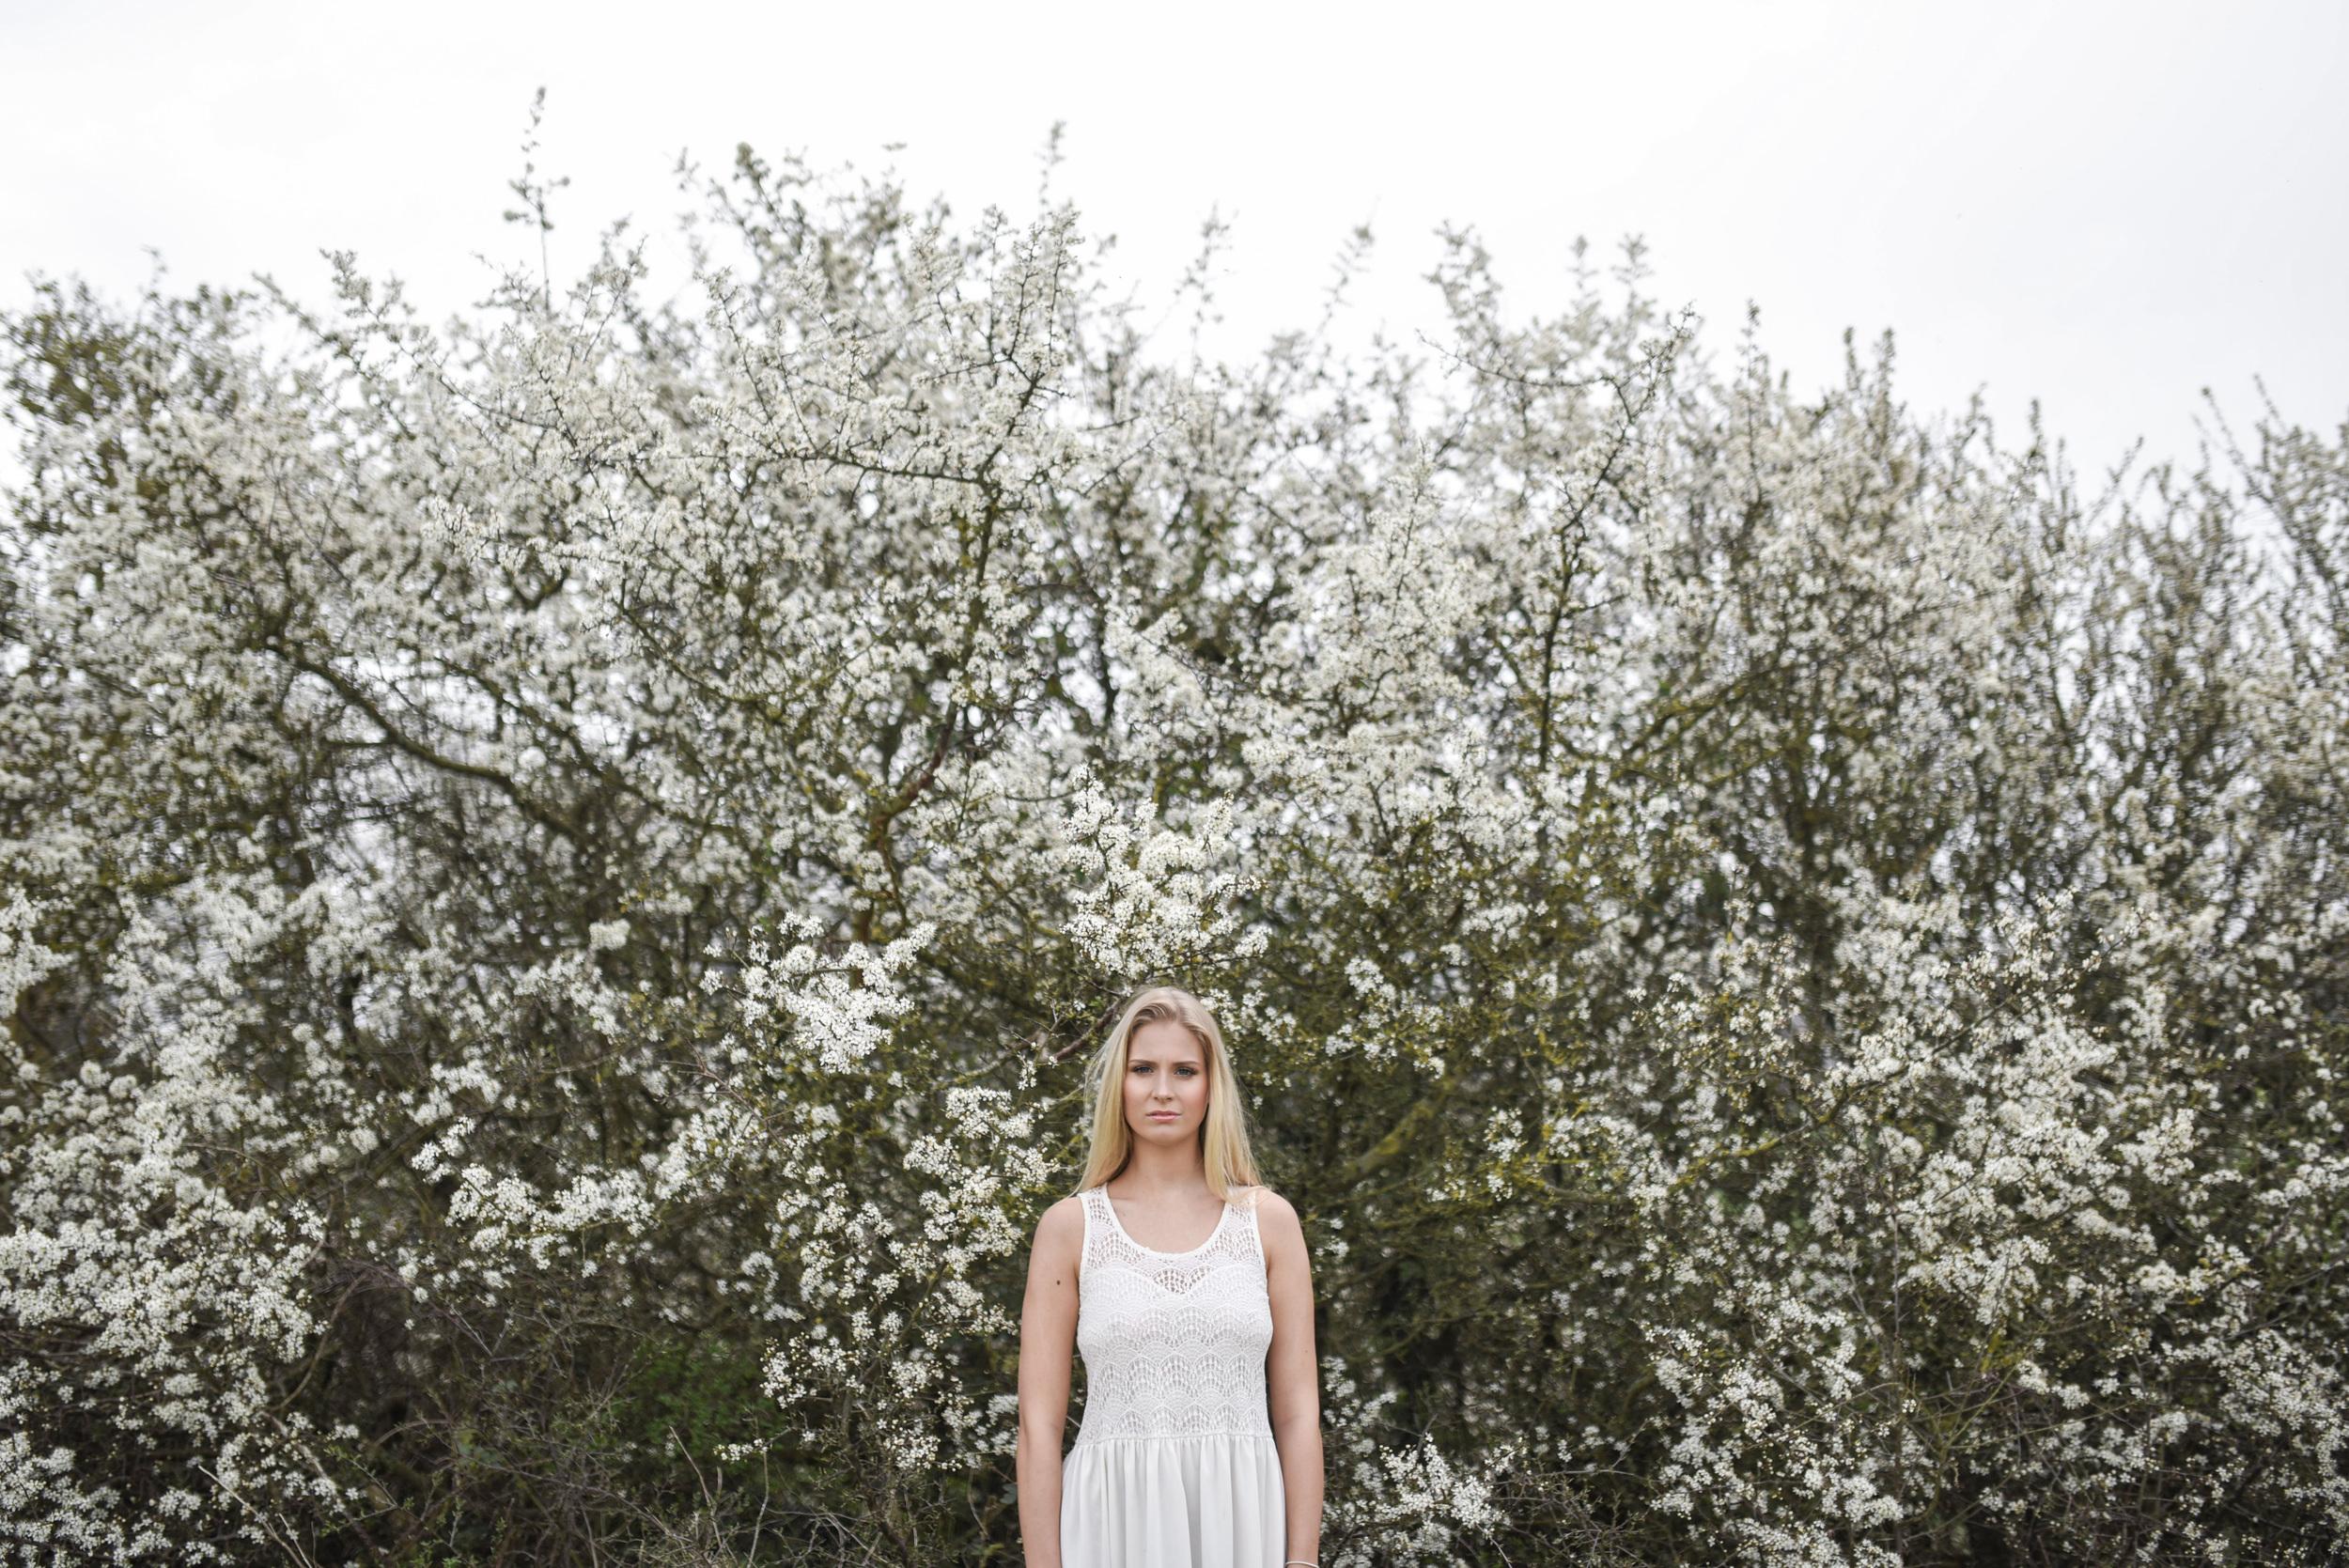 Tara-Florence-Photography-Spring-Bloom-5.jpg